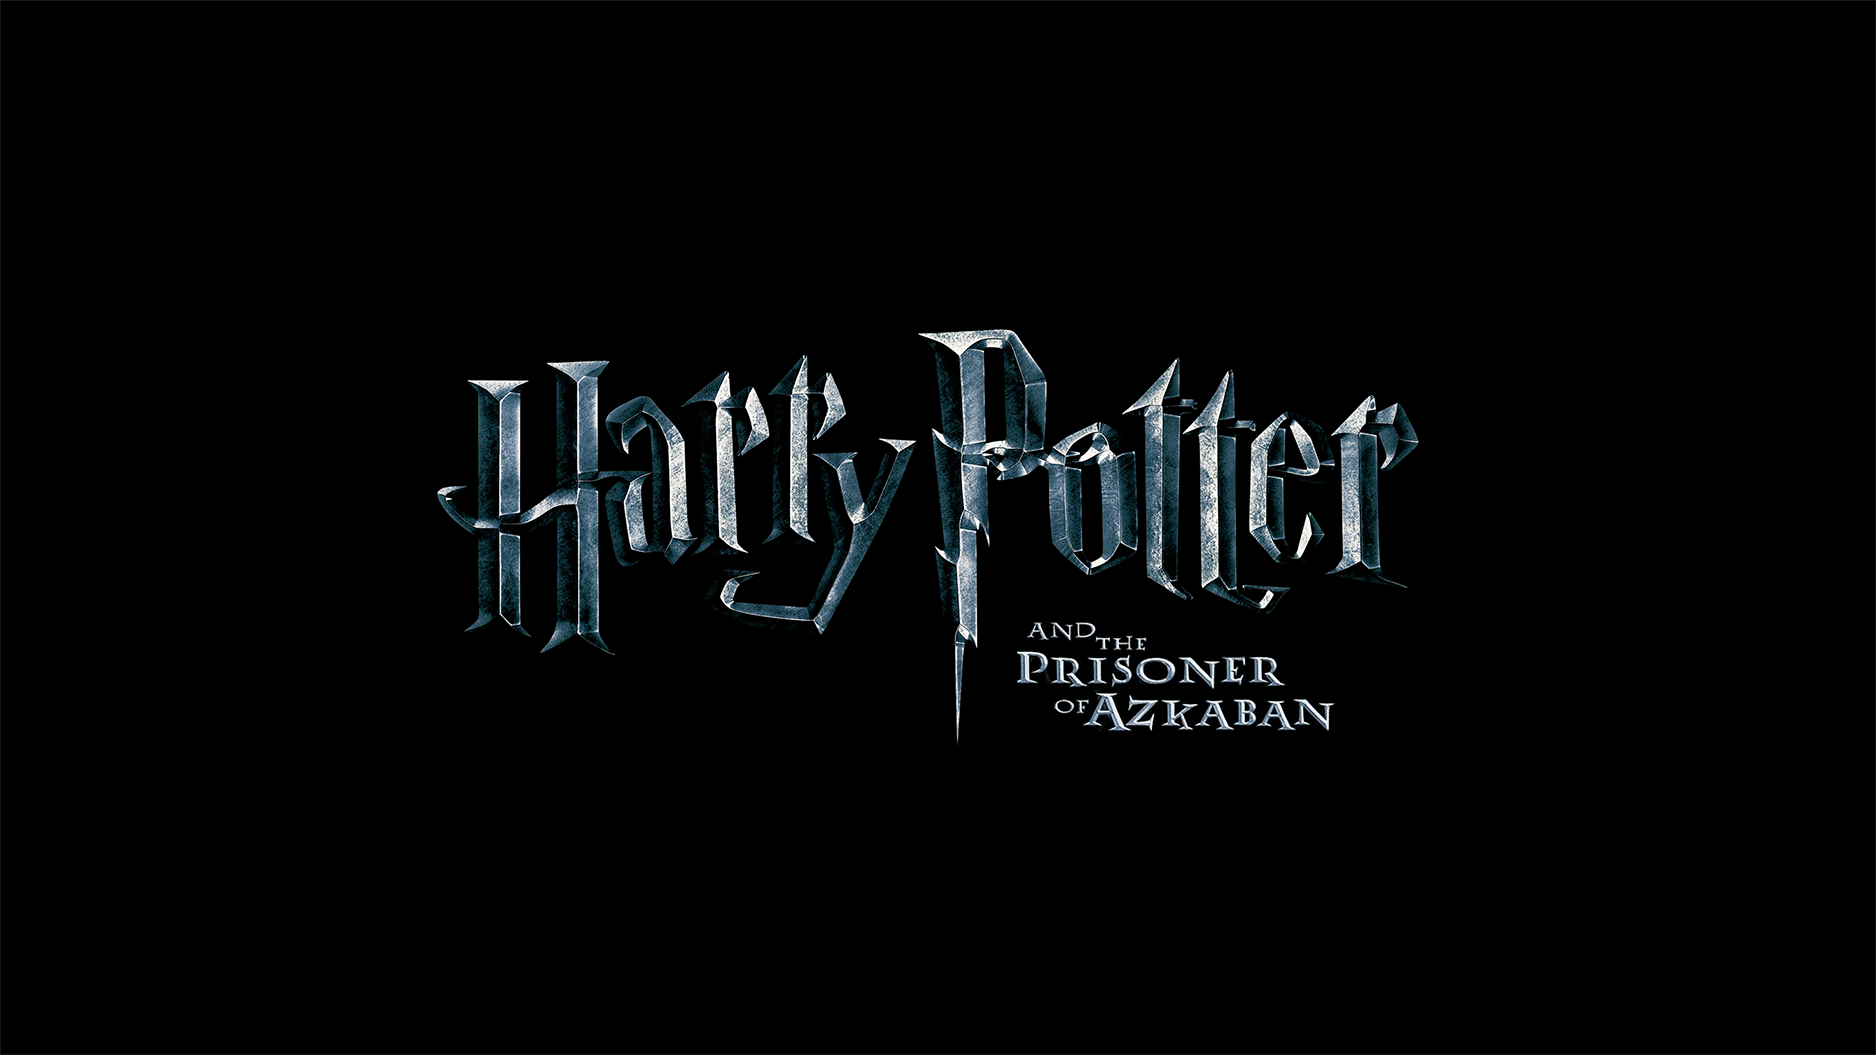 FILM - Harry Potter u0026 The Prisoner of Azkaban - CG Lighting FX u0026 Animation u2014 Mat McCosker  sc 1 st  Mat McCosker & FILM - Harry Potter u0026 The Prisoner of Azkaban - CG Lighting FX ... azcodes.com